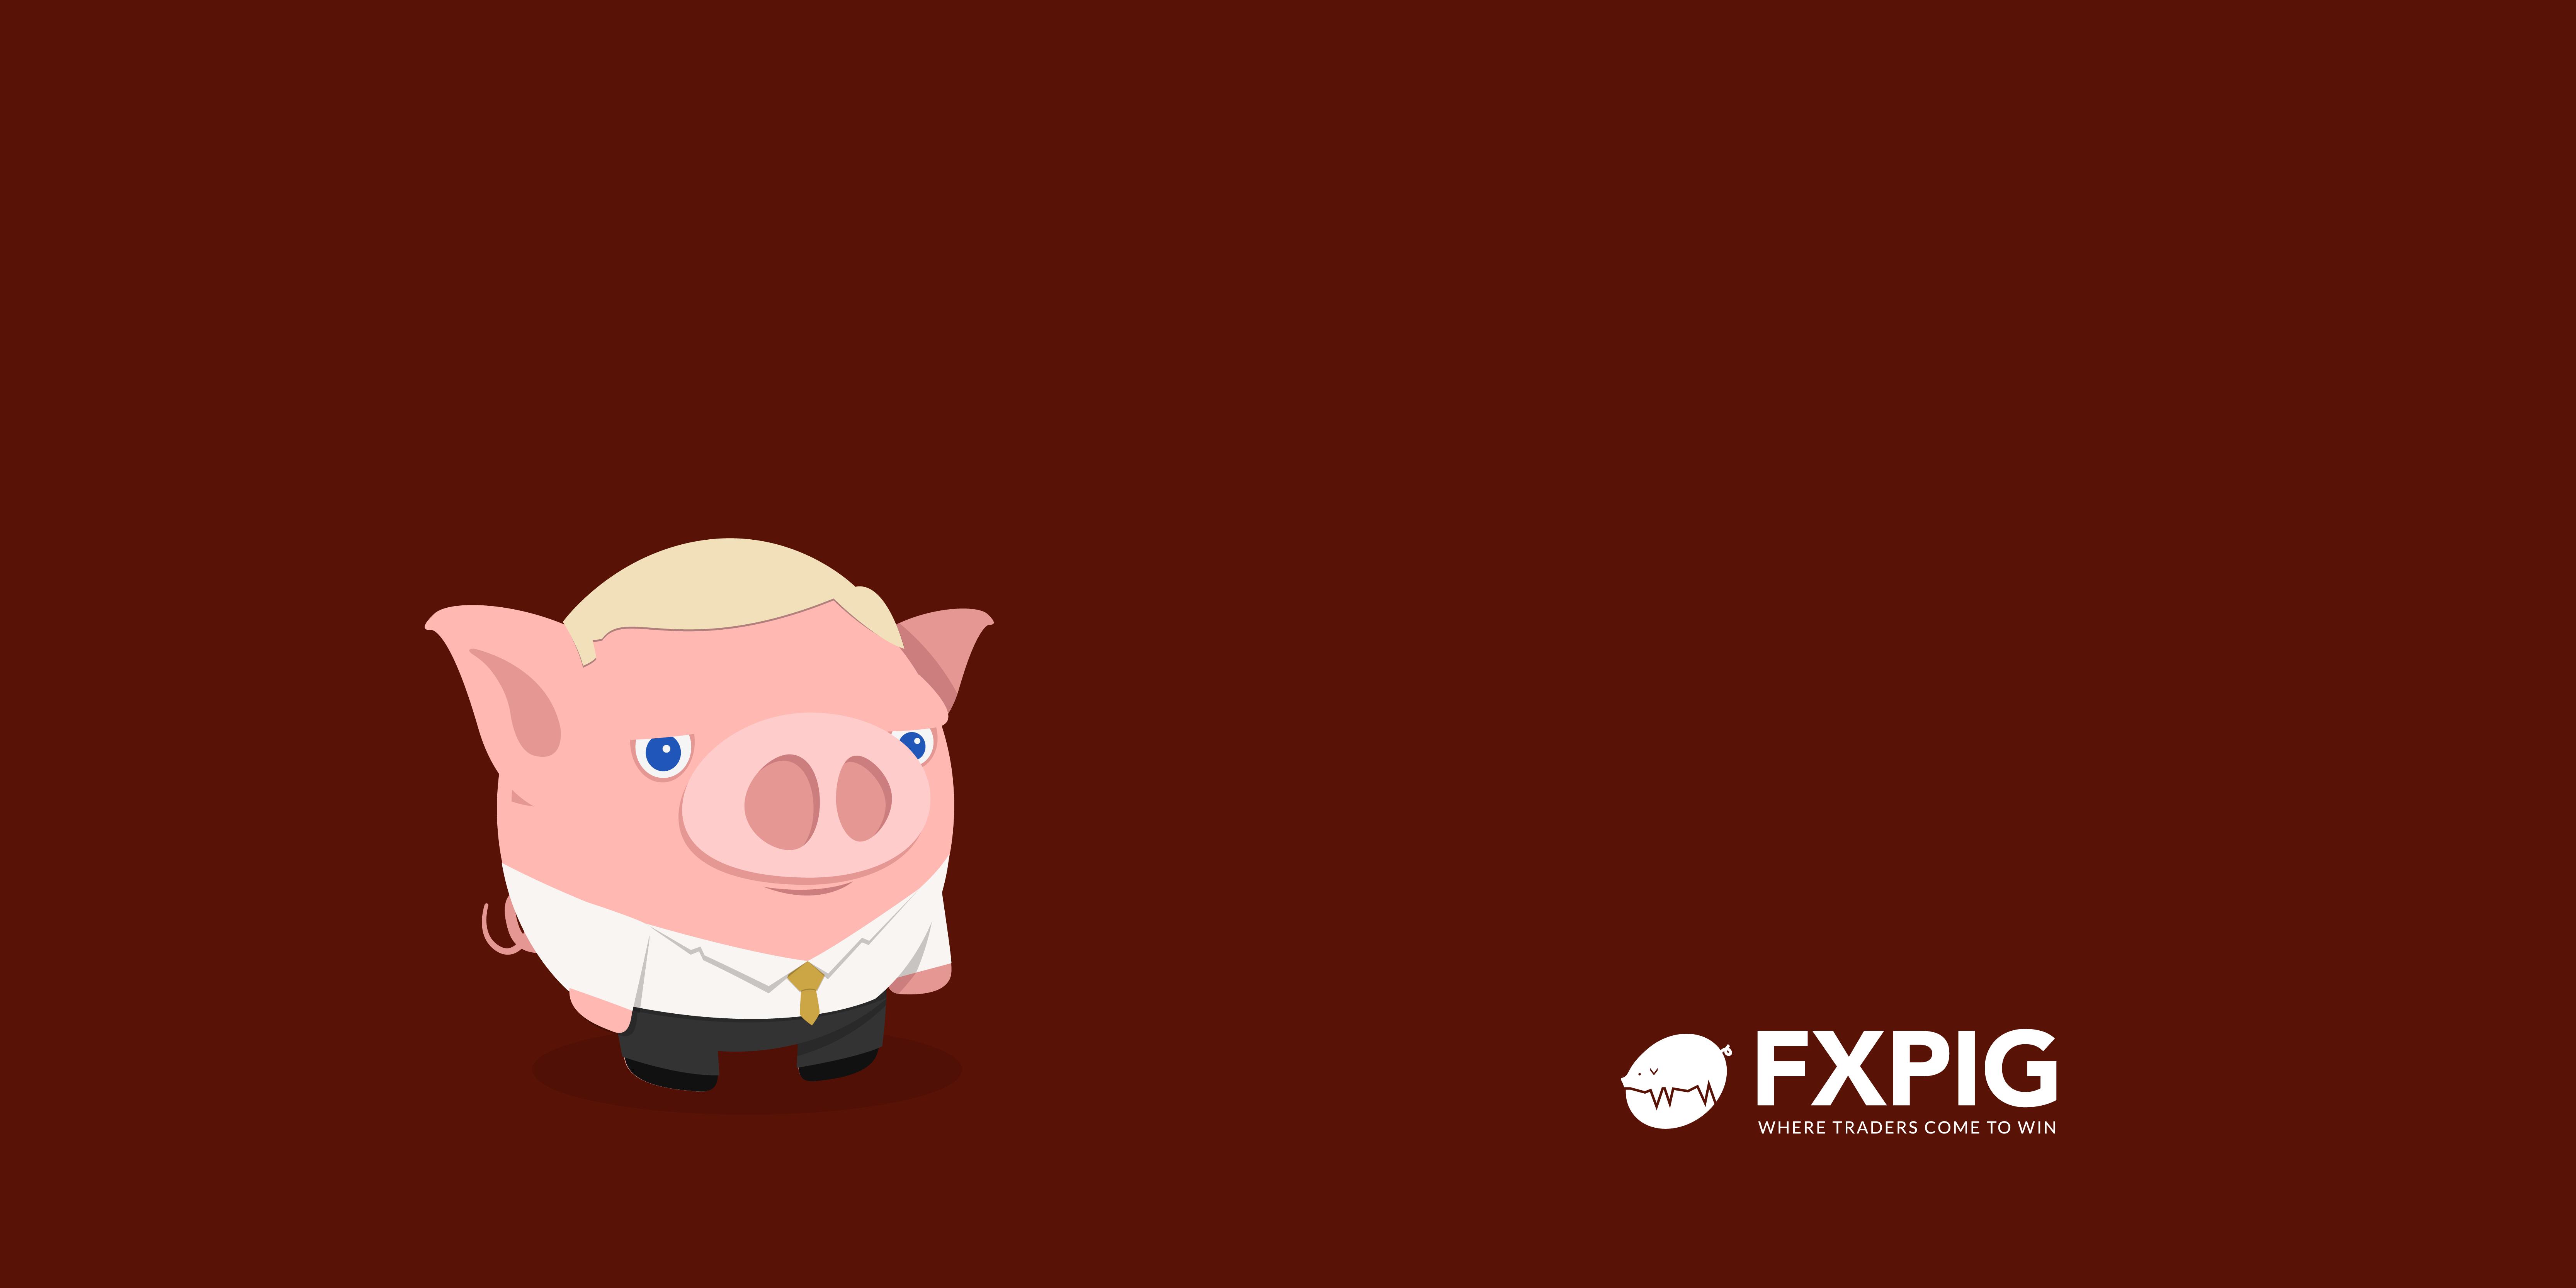 Forex-trading-wisdom_developing-a-system_Seykota_FXPIG